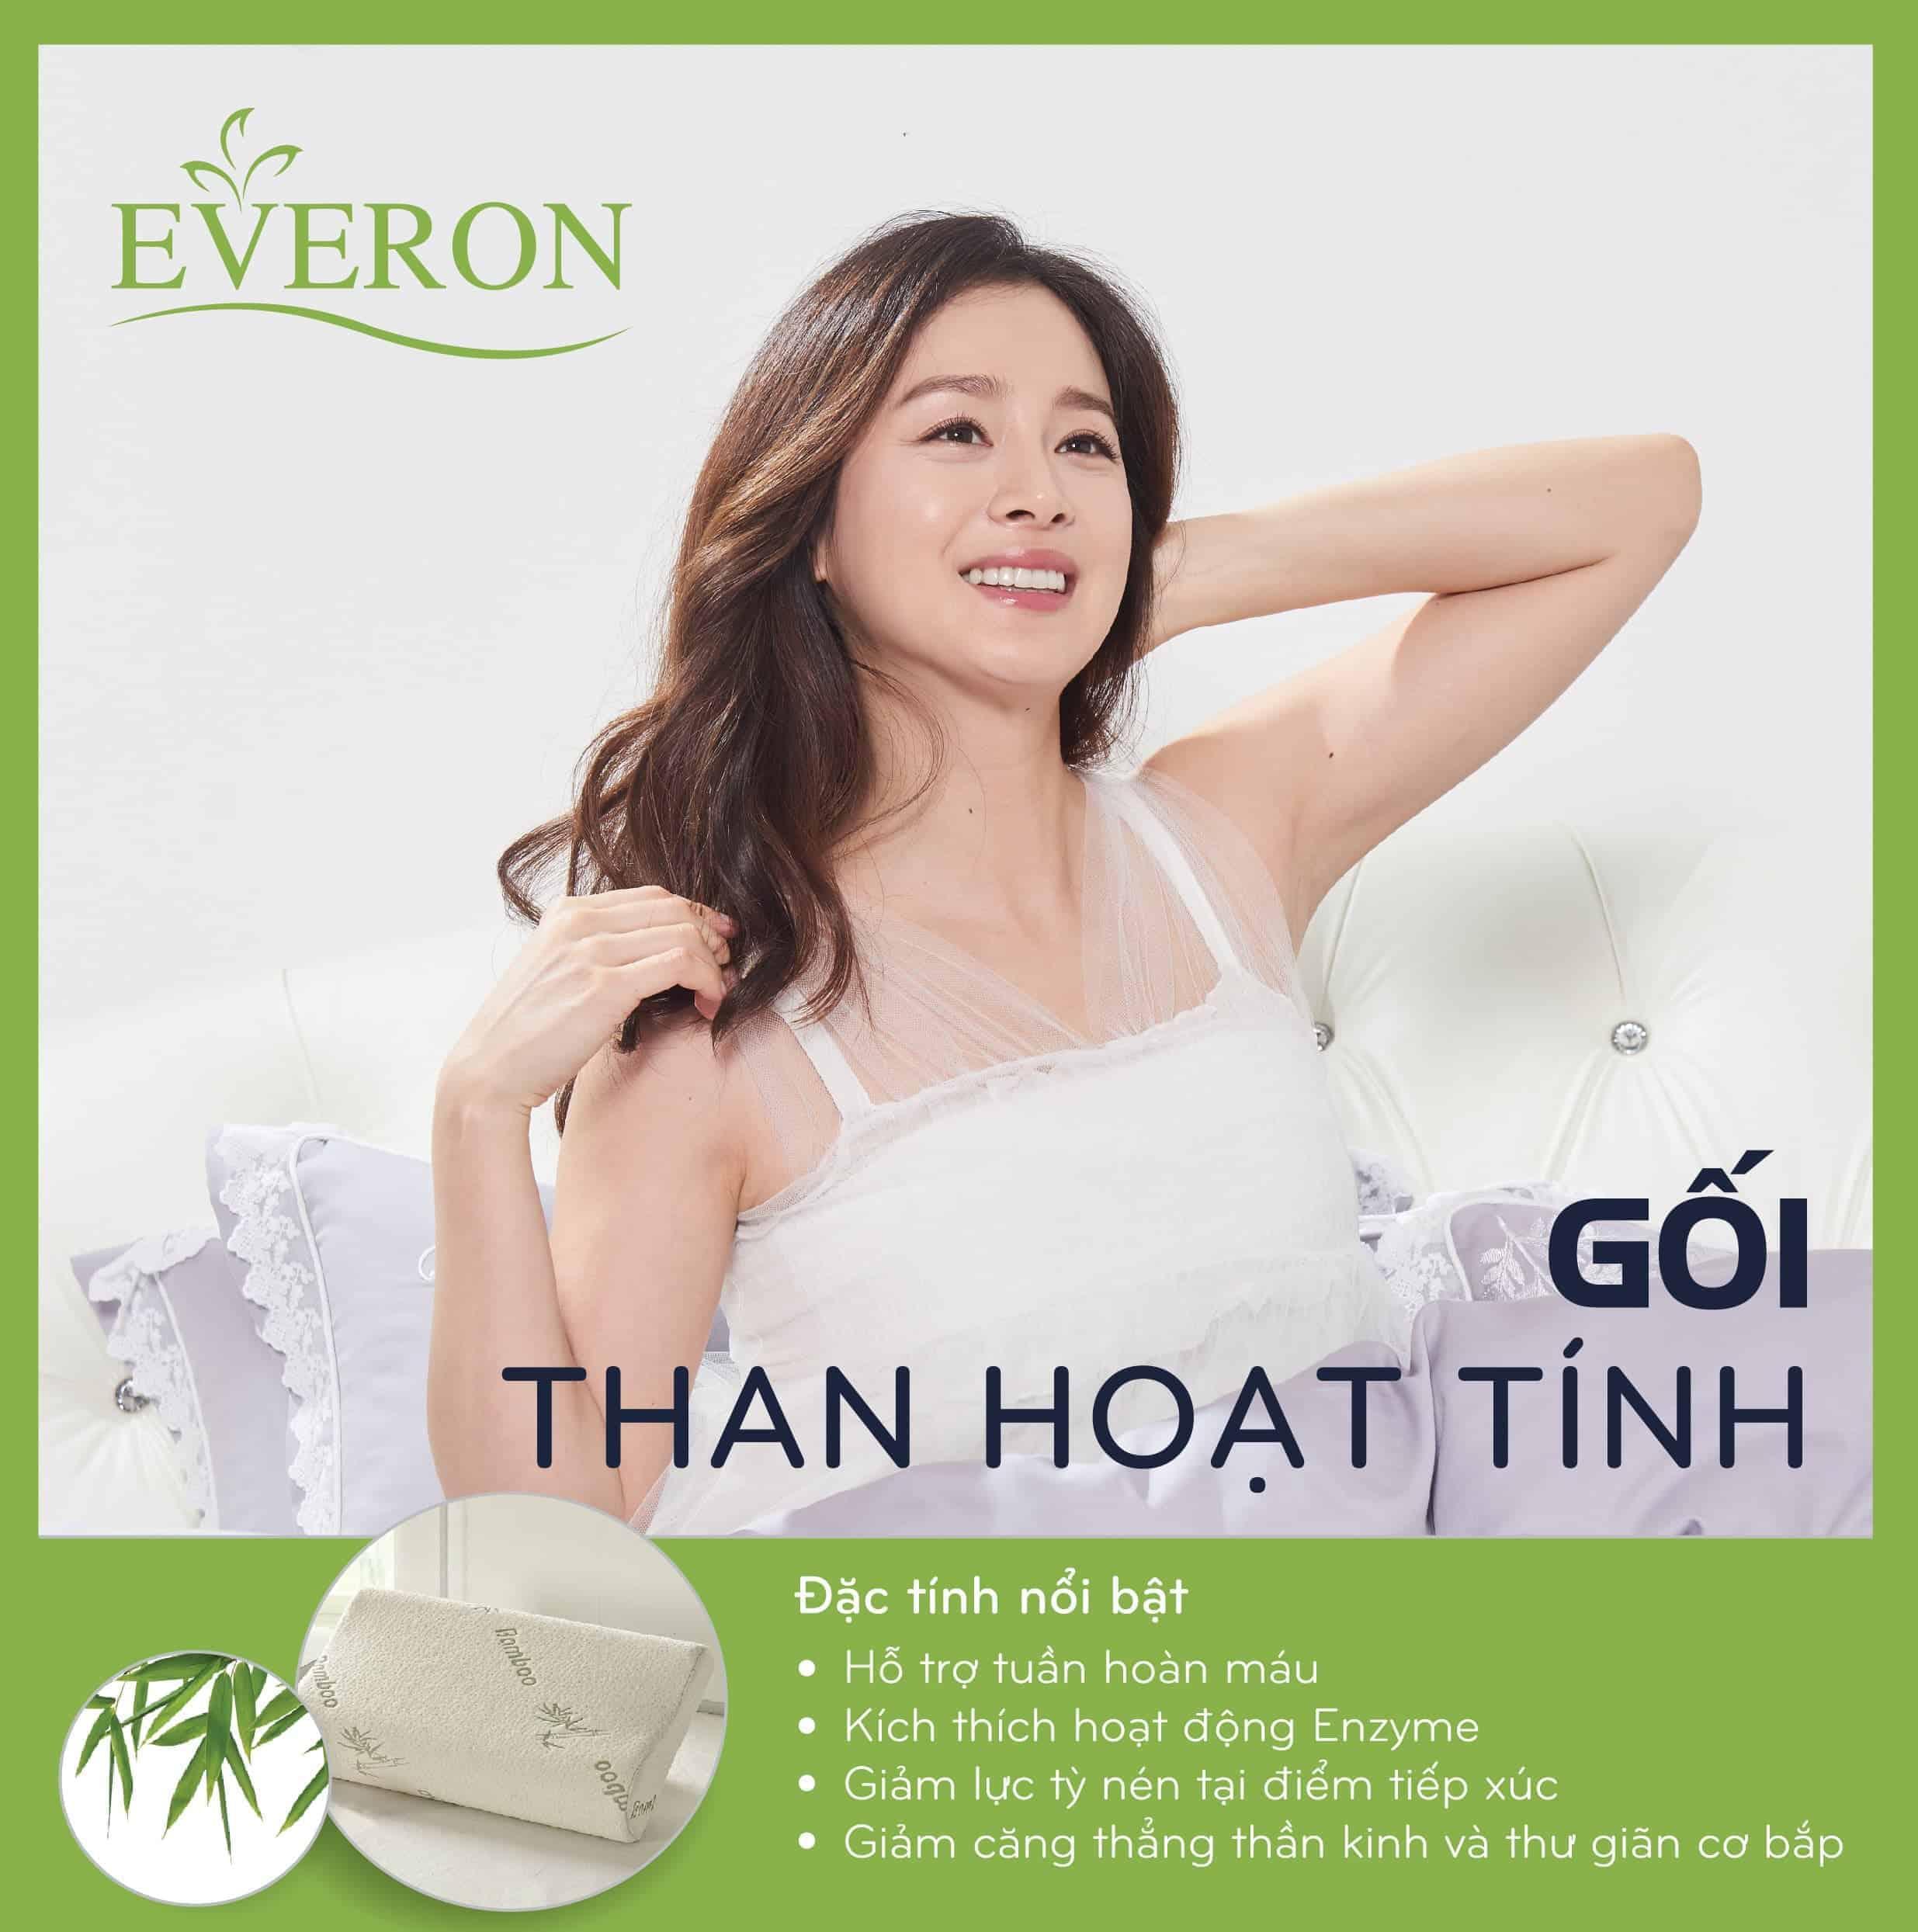 Than Hoat Tinh 01 01